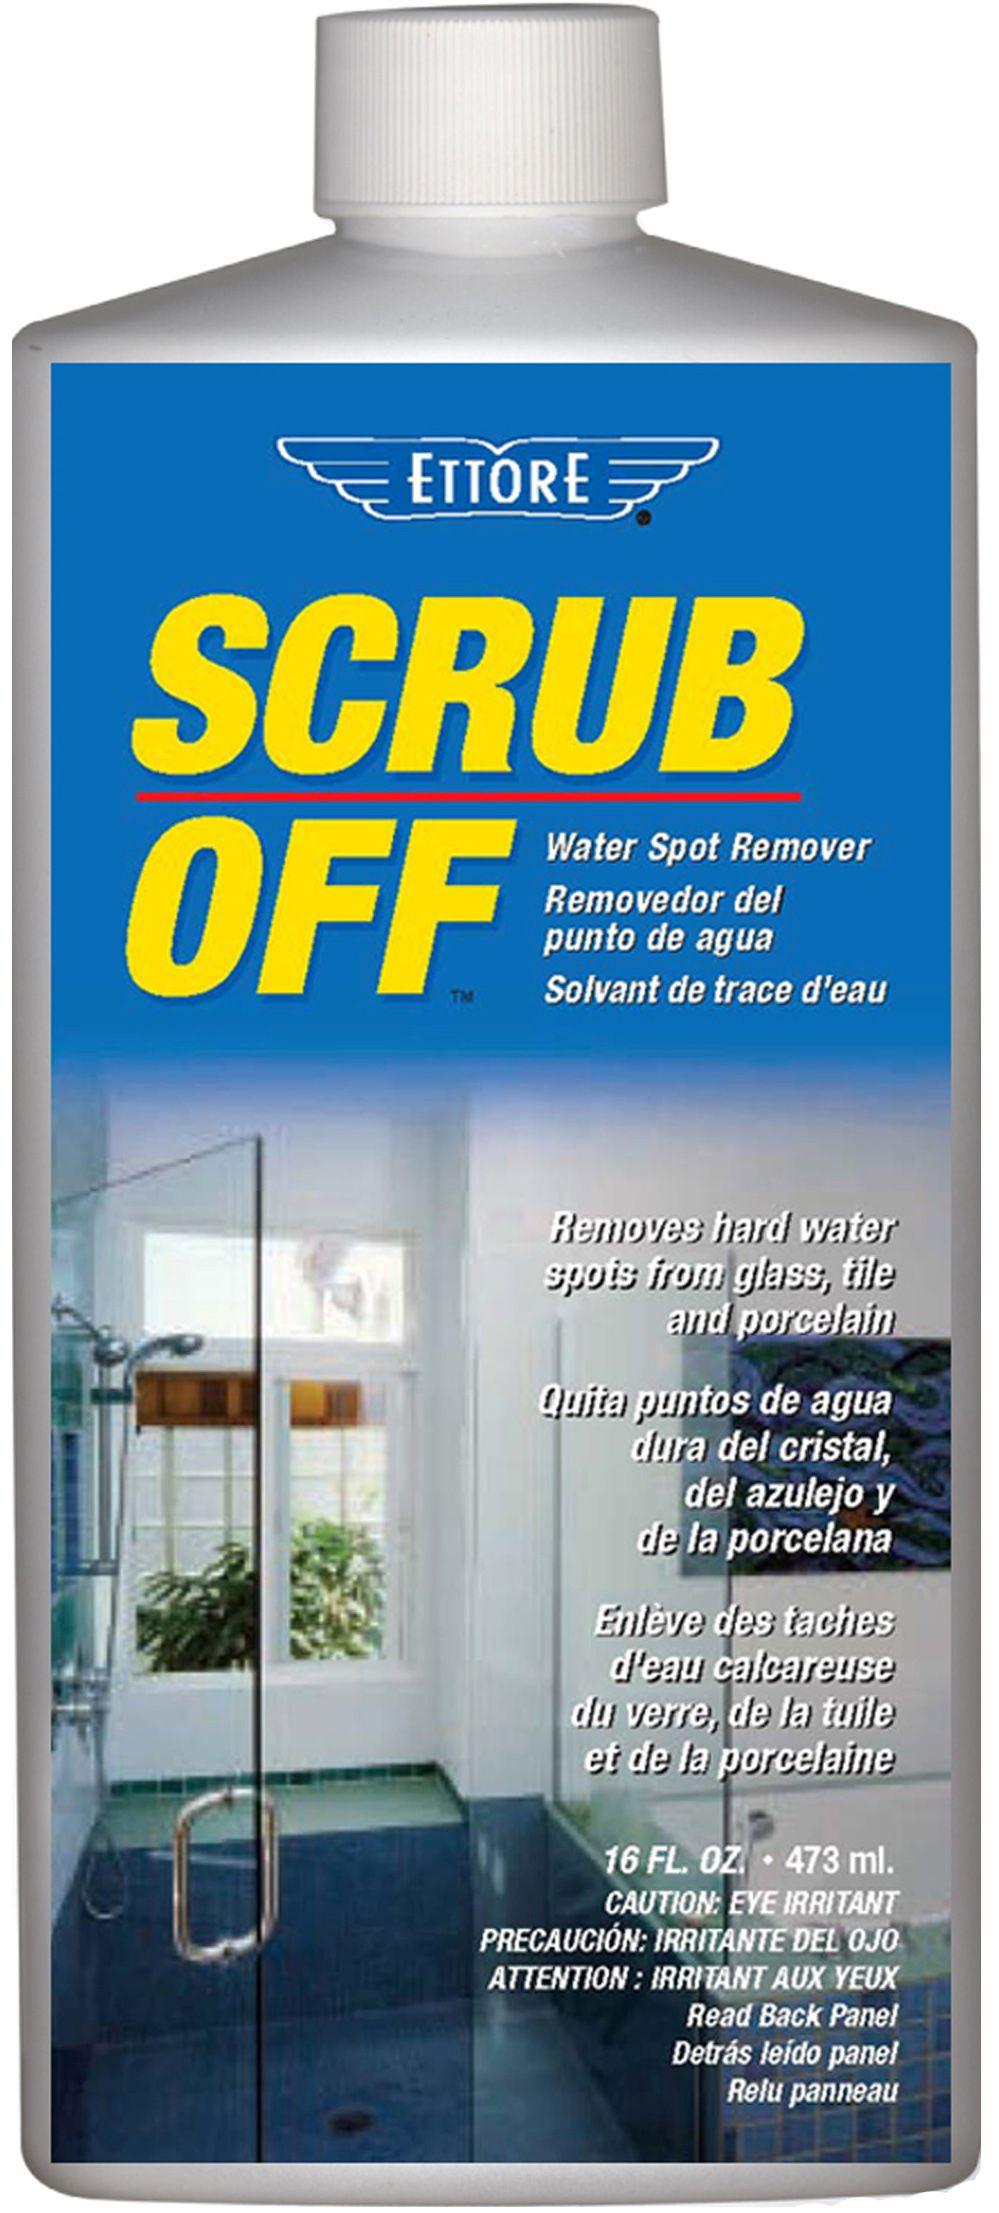 Ettore Scrub Off Spot Remover Removes Stubborn Hard Water Stains